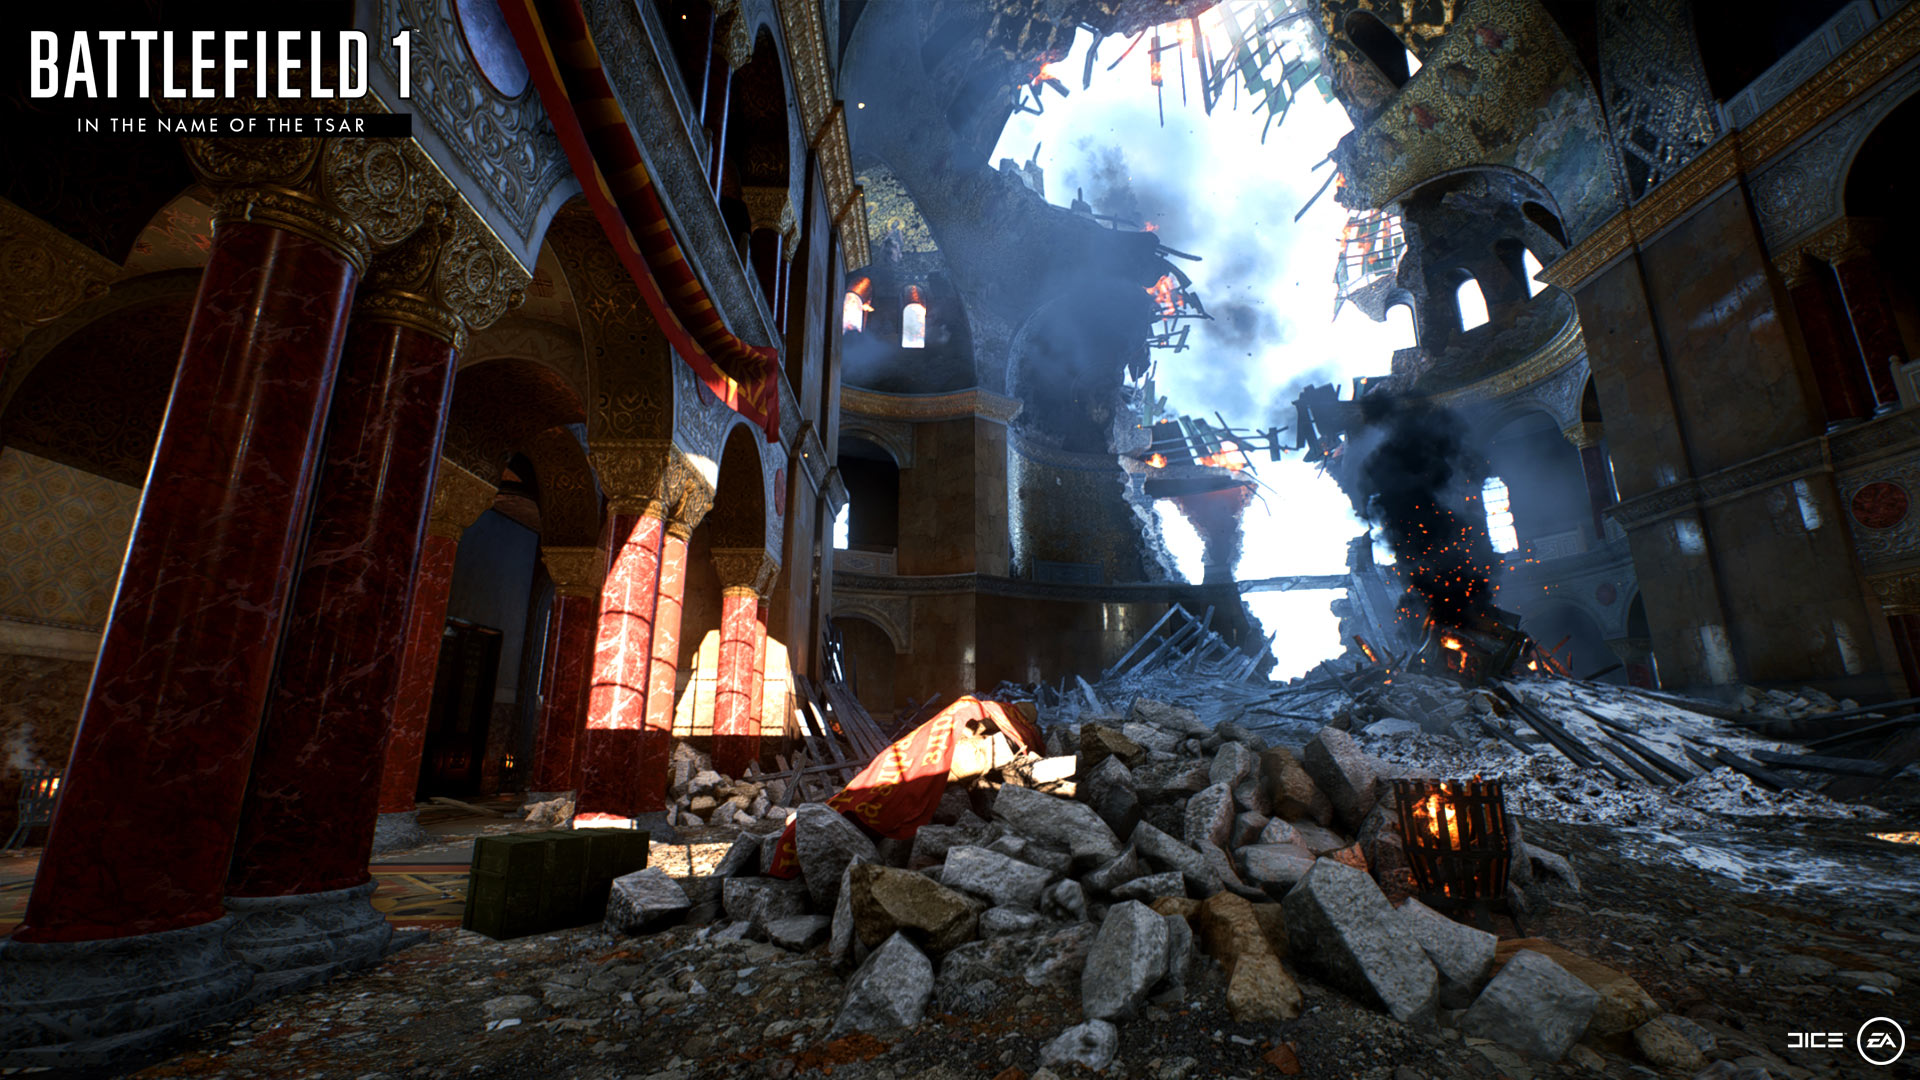 Battlefield 1 W imię cara - Carycyn